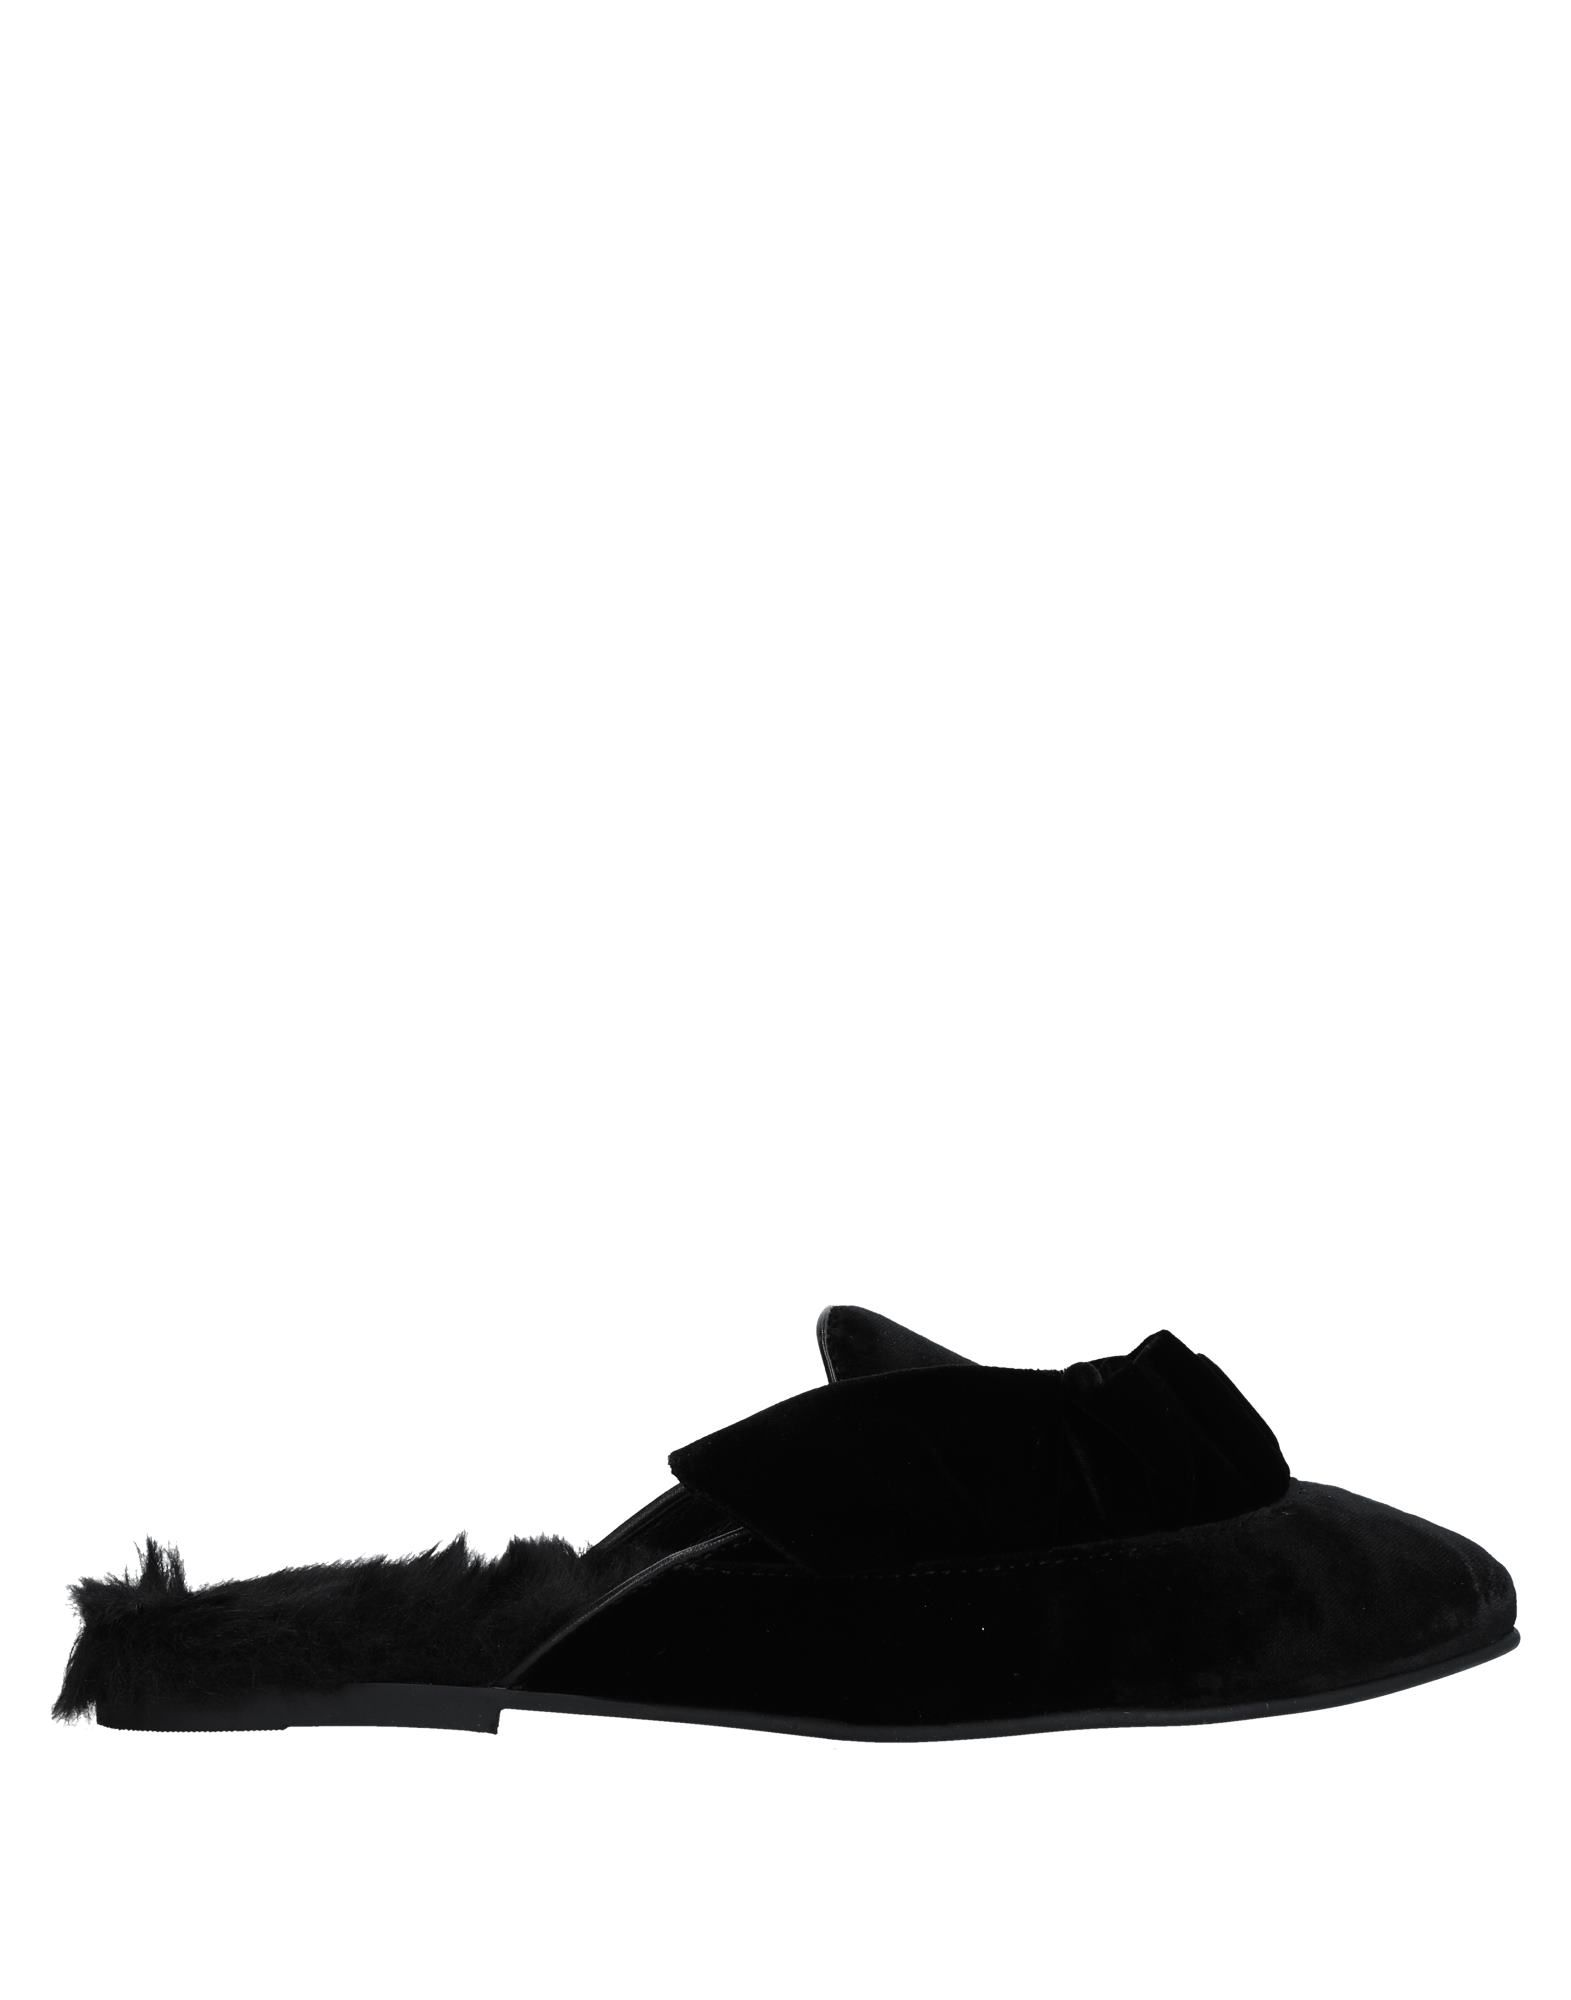 Via Vela 14 Pantoletten Damen  11542685JCGut aussehende strapazierfähige Schuhe